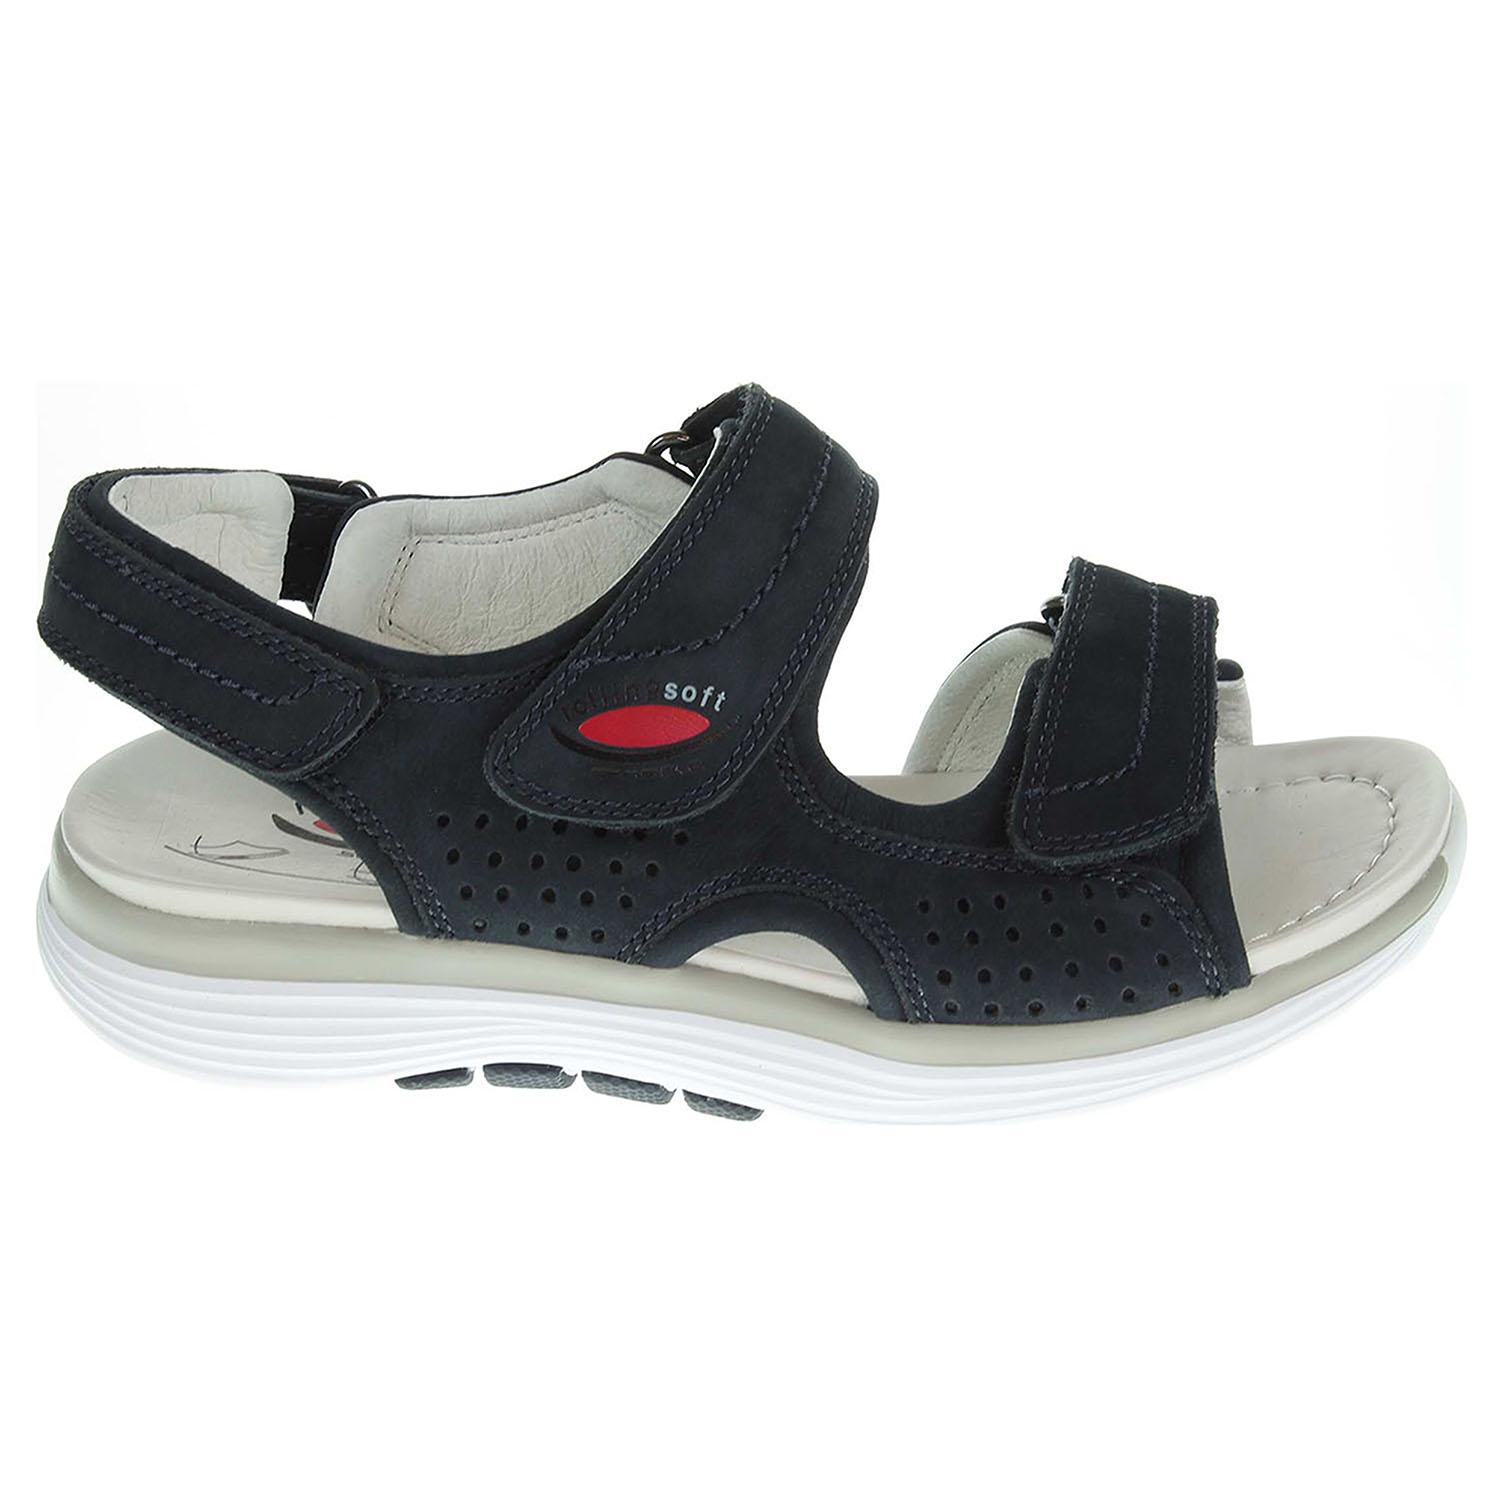 Ecco Gabor dámské sandály 46.910.46 modré 23800919